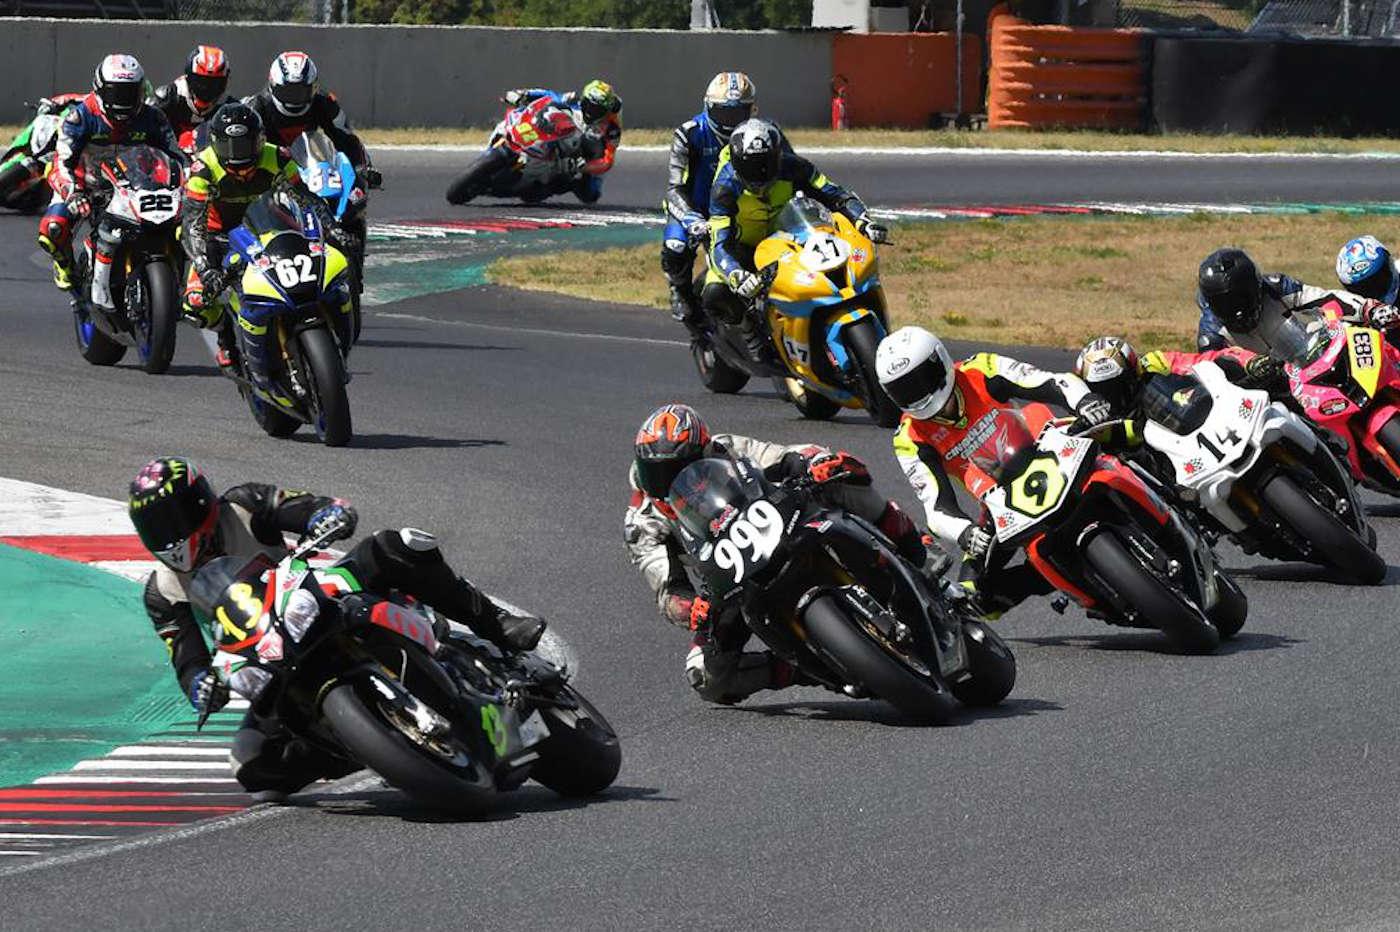 Trofeo Italiano Amatori 2021